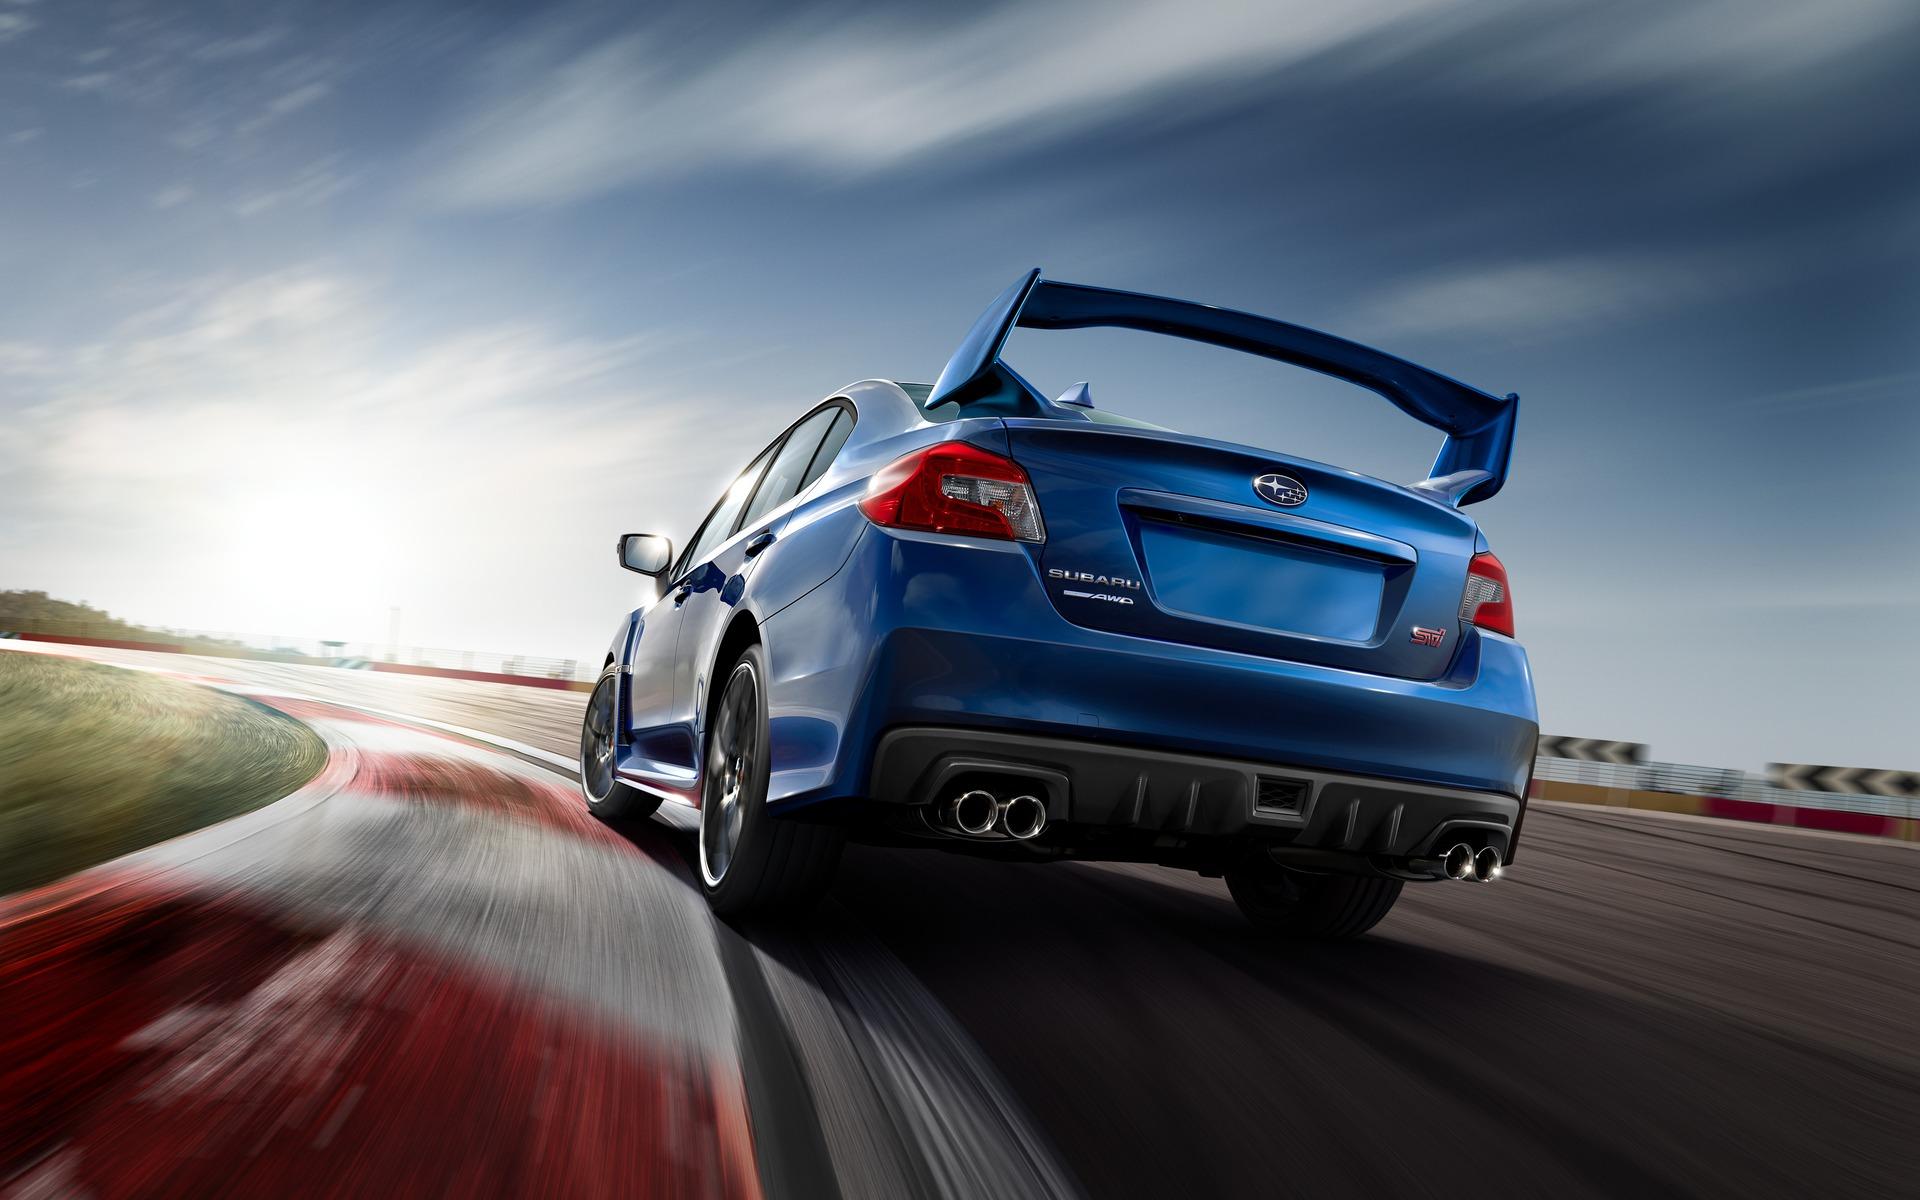 2020 Subaru Wrx And Wrx Sti Get Minor Updates The Car Guide